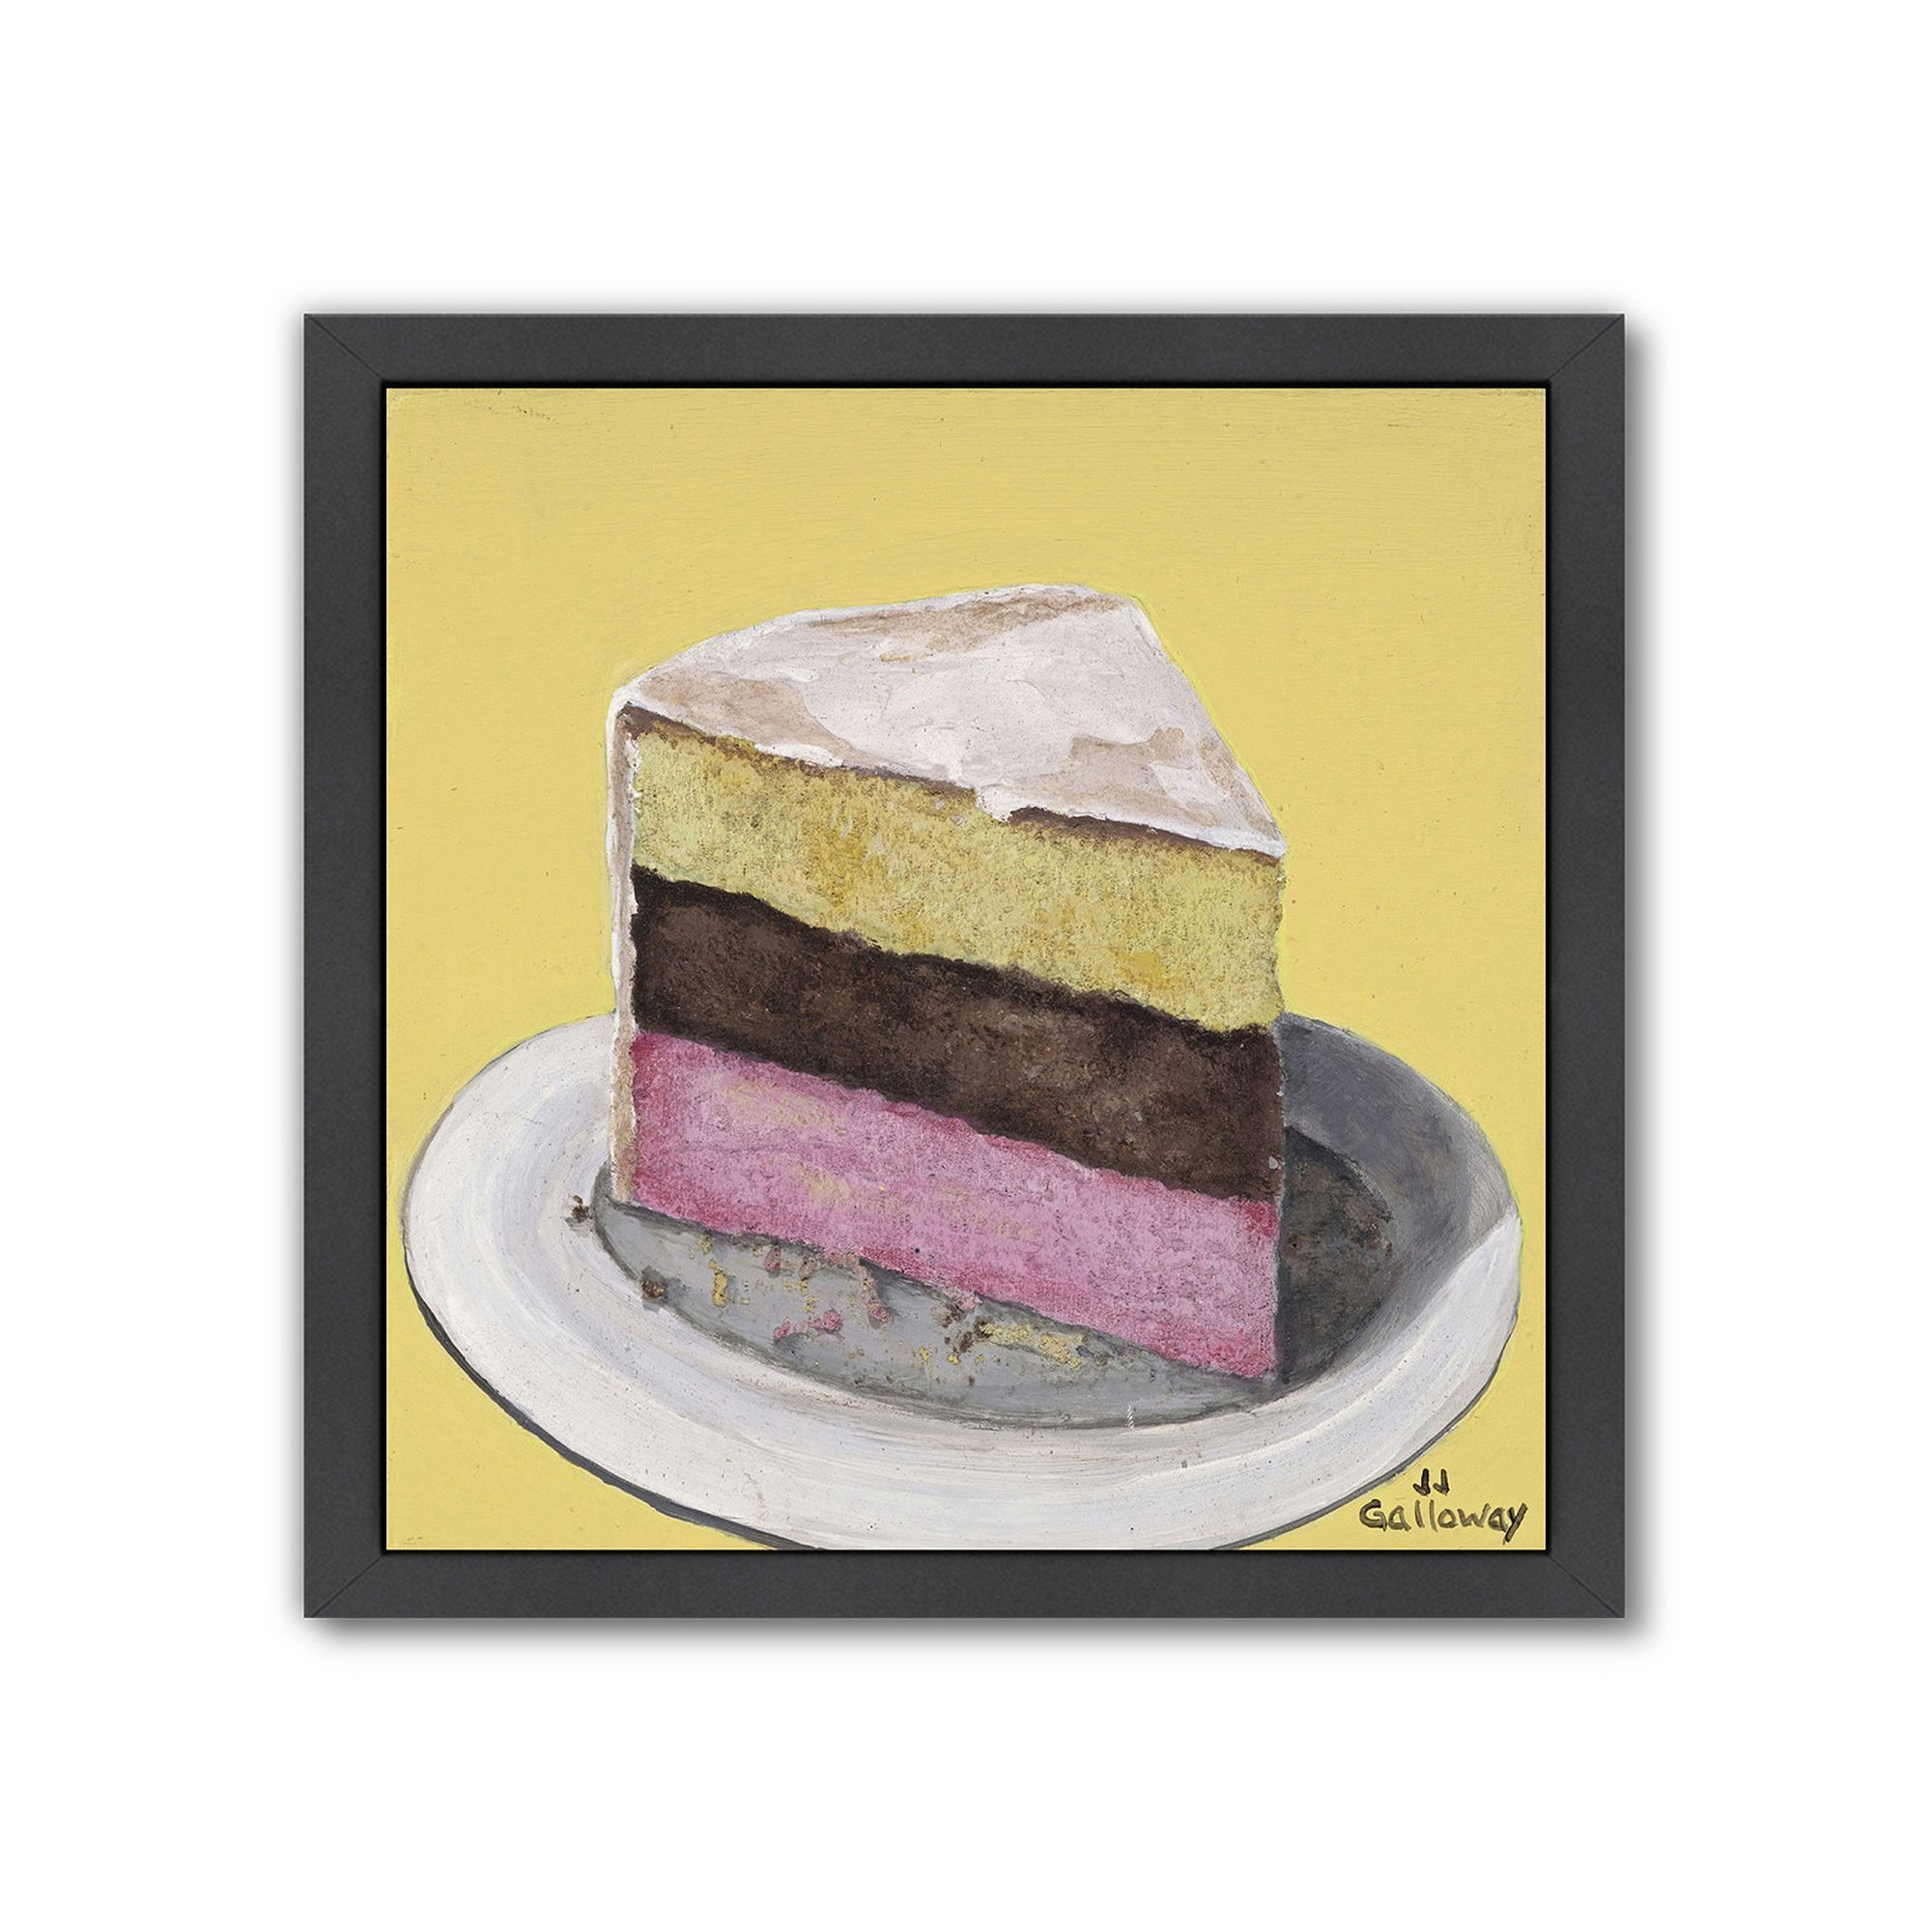 Americanflat Neapolitan Slice Black Framed Wall Art, Multicolor ...